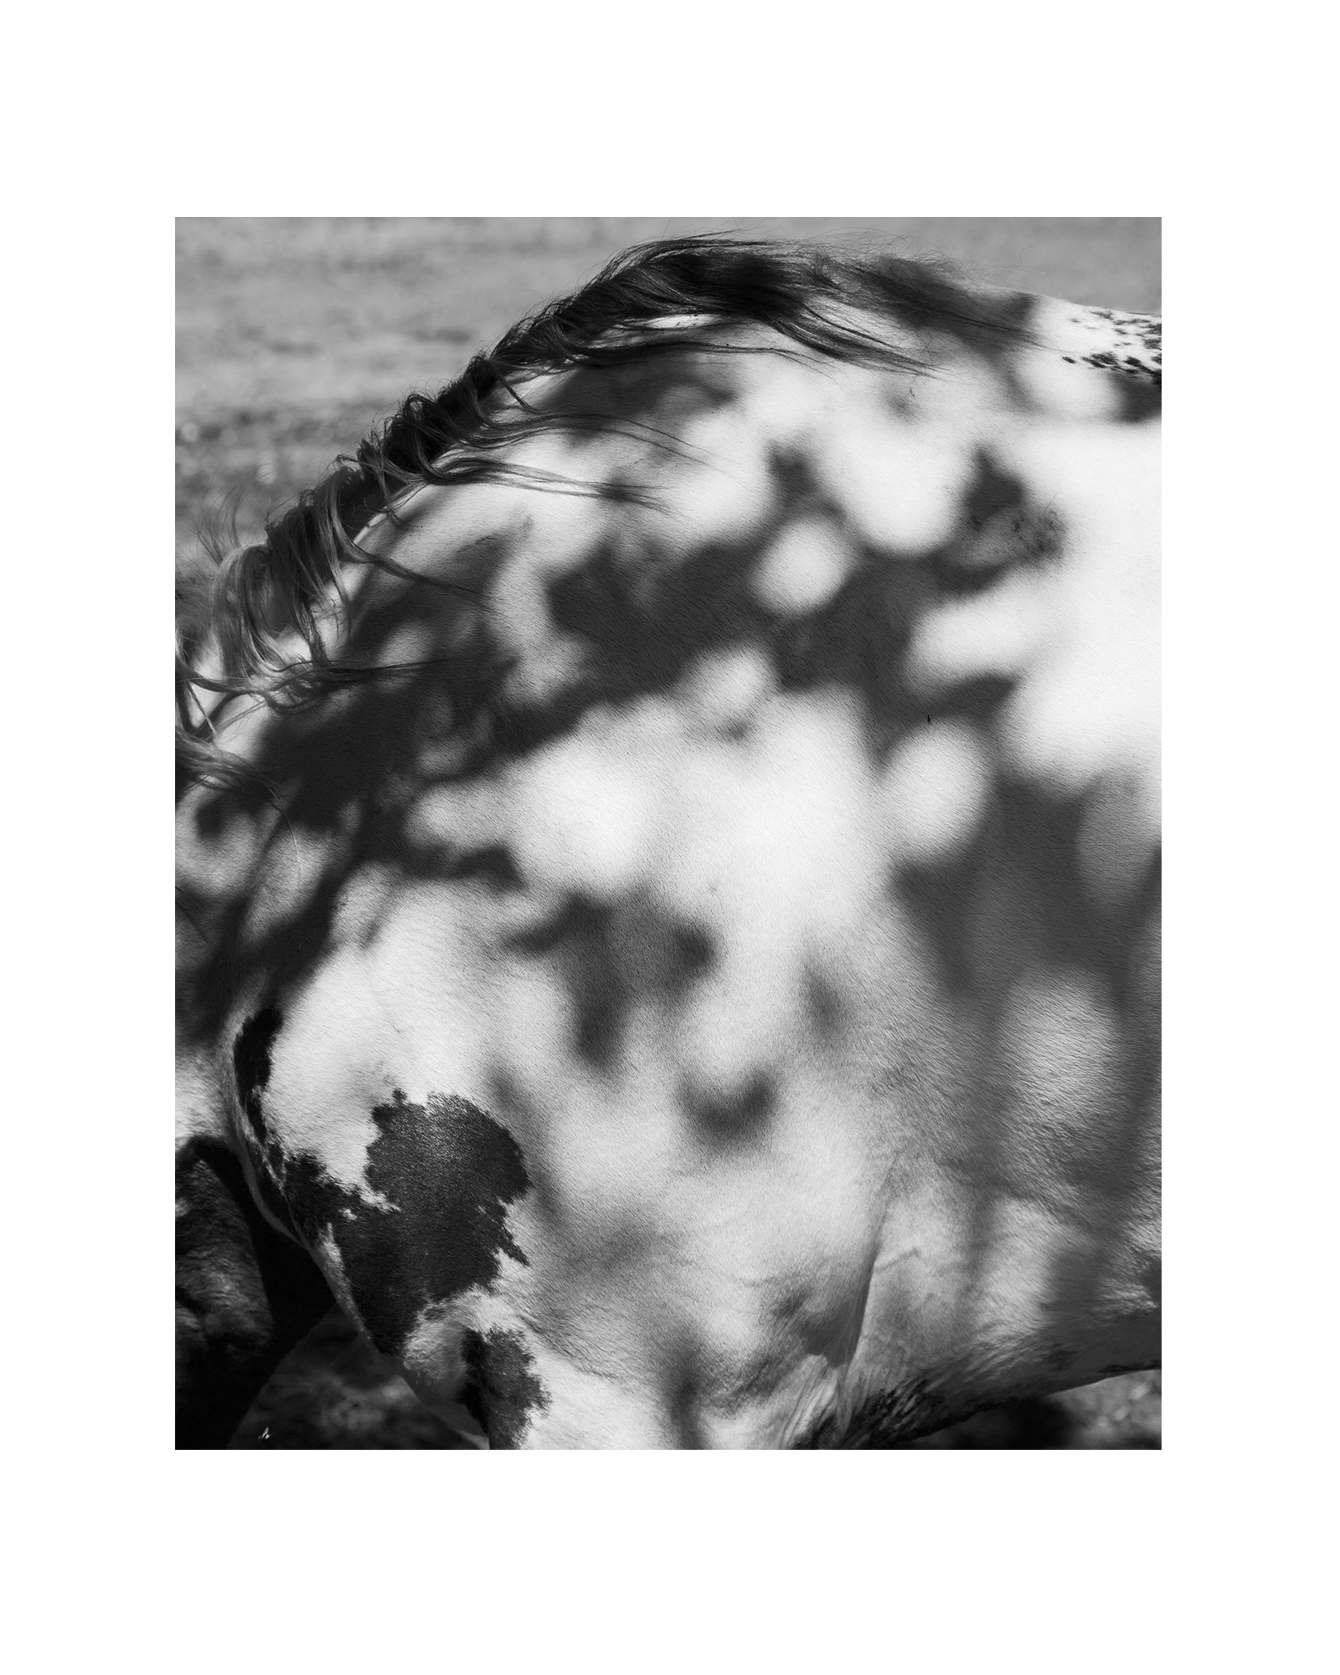 Horseback_1340_c.jpg